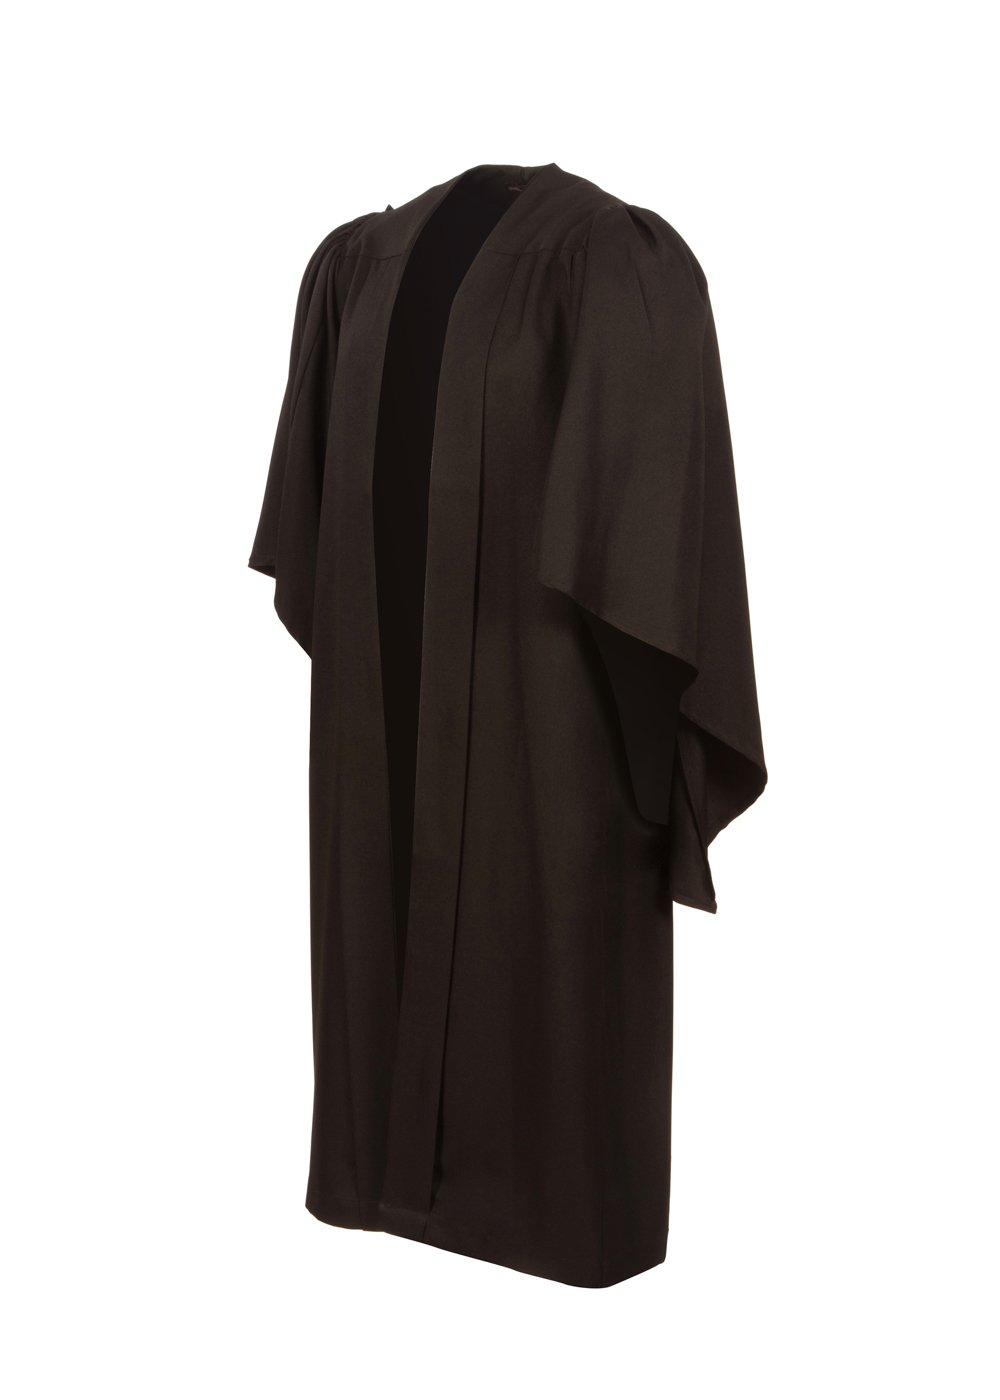 University academic graduation gown (Bachelors) (4'9-4'11)